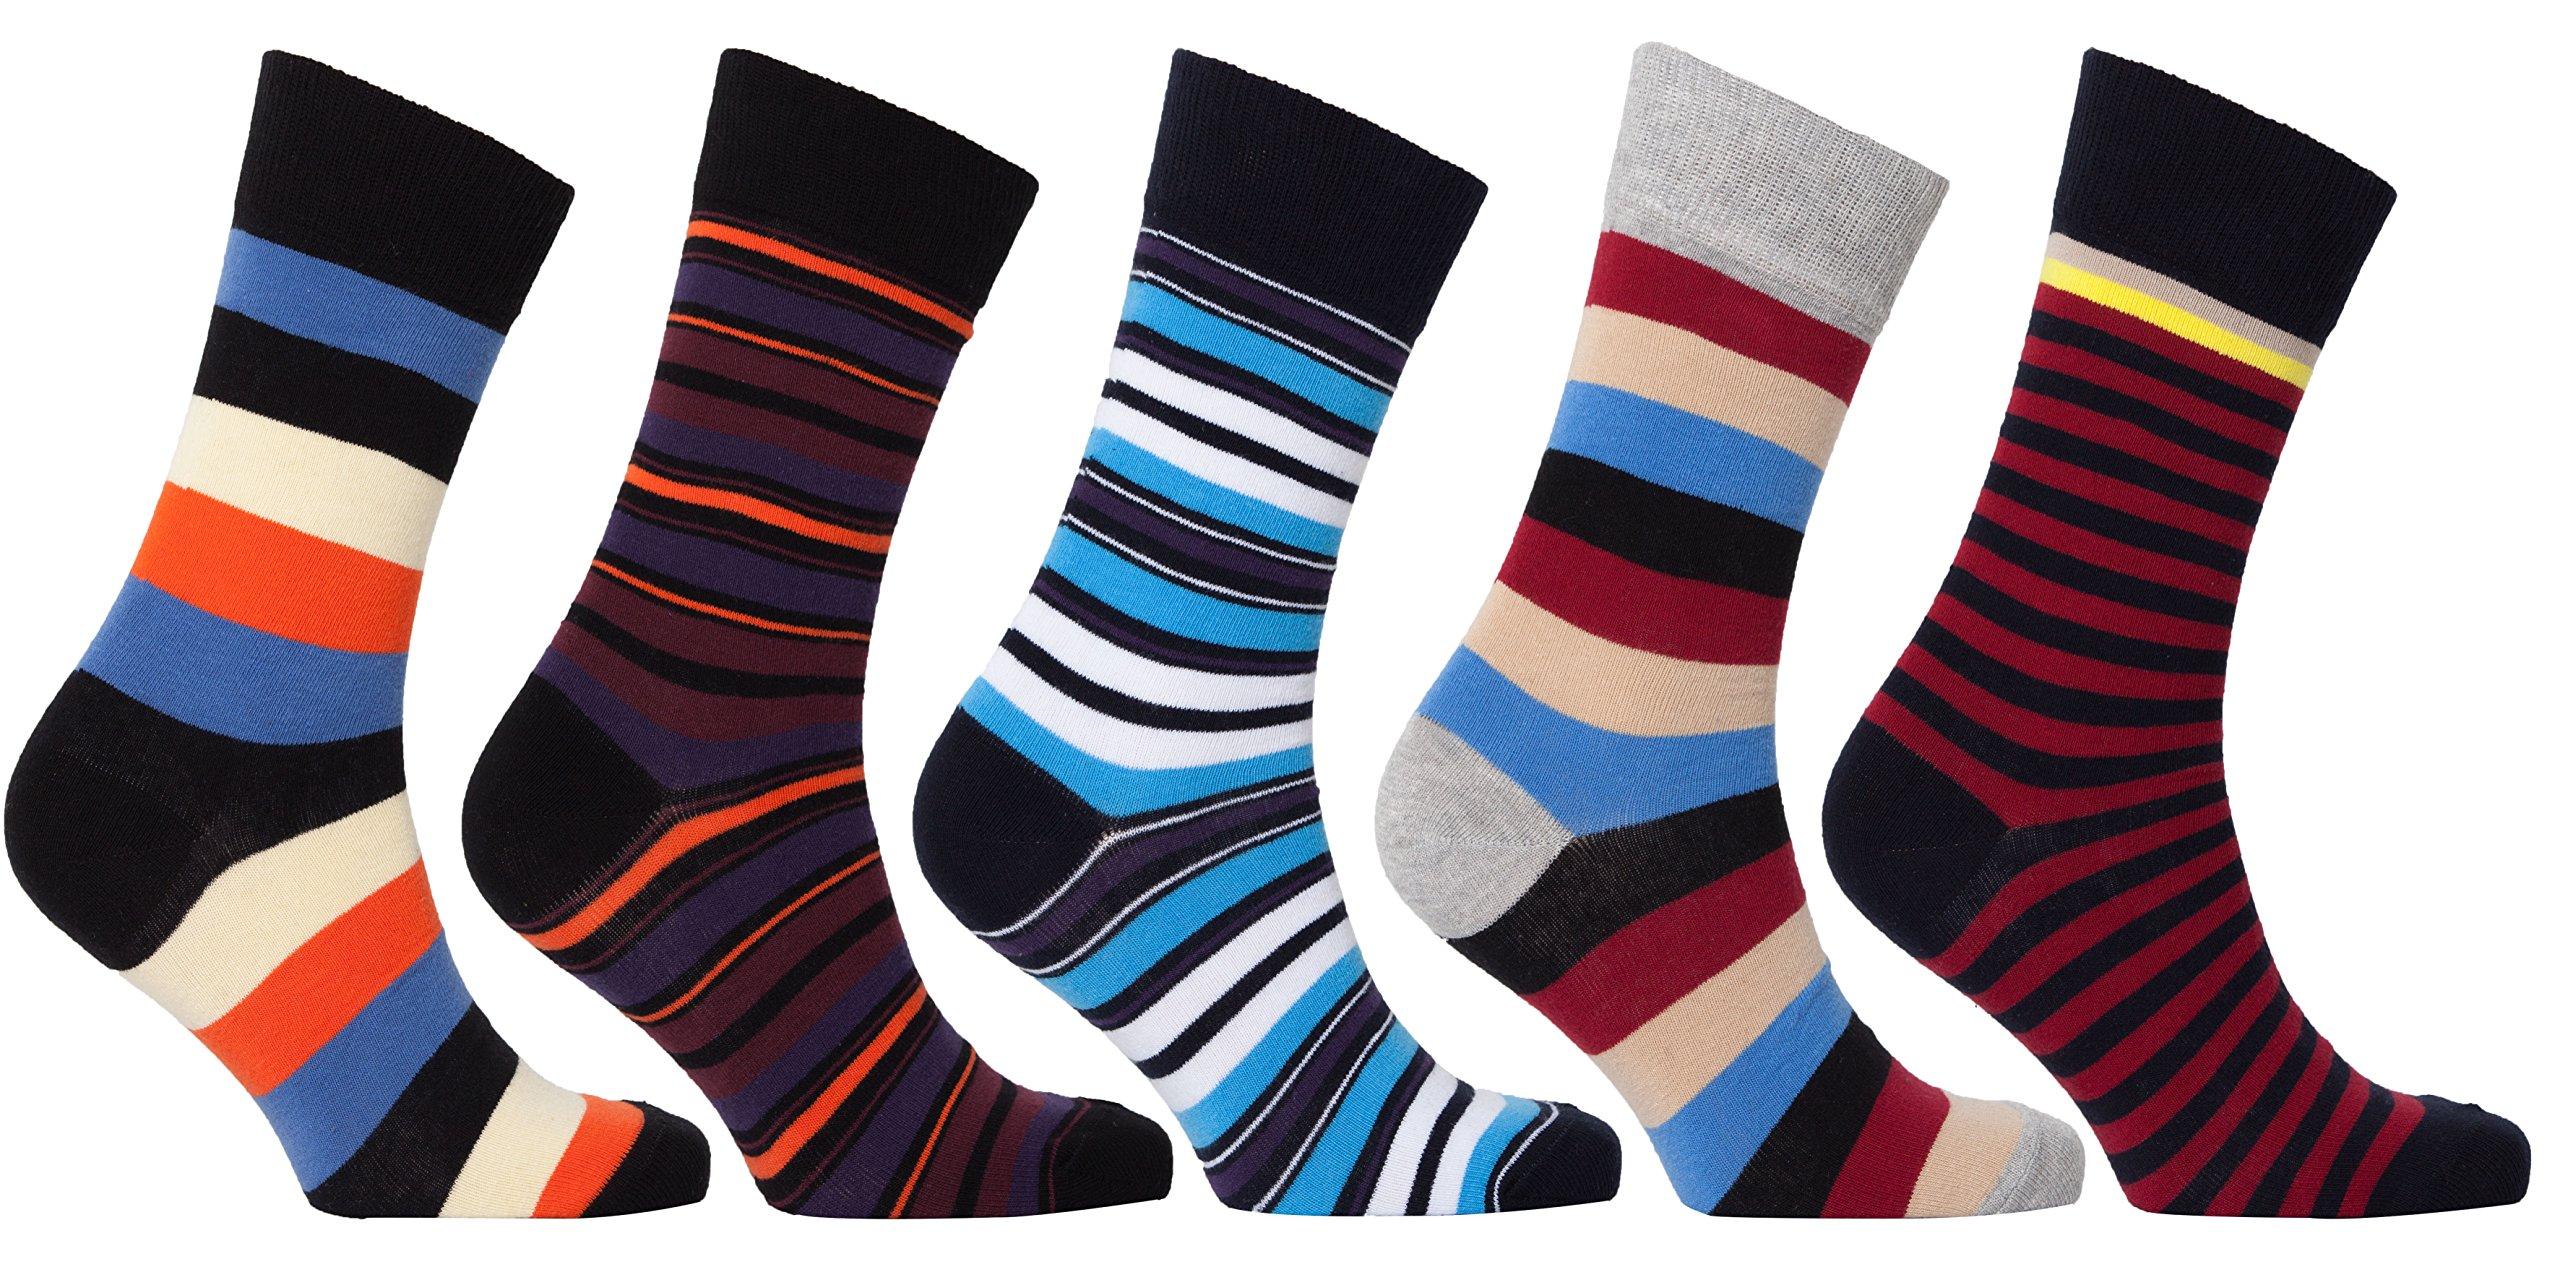 Socks n Socks - Men's 5-pair Striped Luxury Turkish Cotton Dress Socks with Gift Box